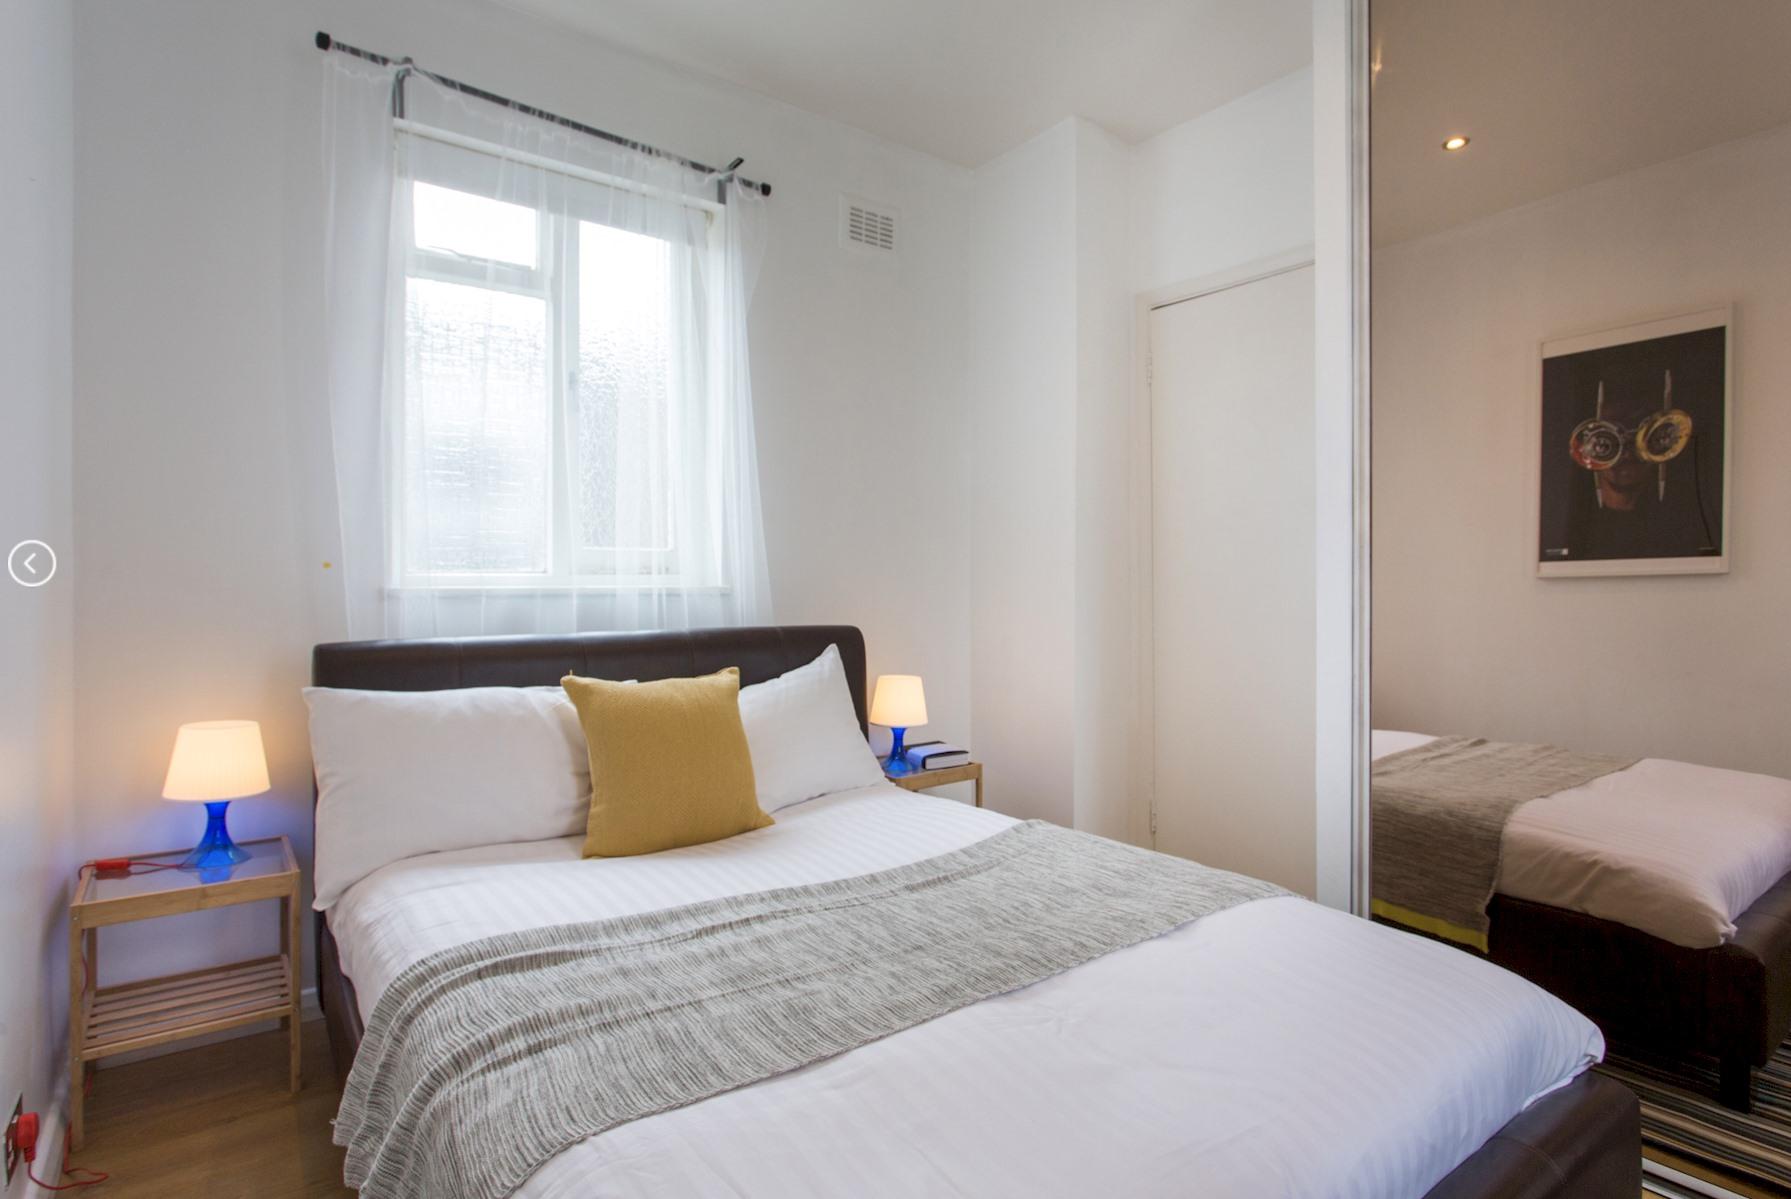 2 Bedroom Apartment near Edgware Road F6 BS (RU/CL) photo 16033546